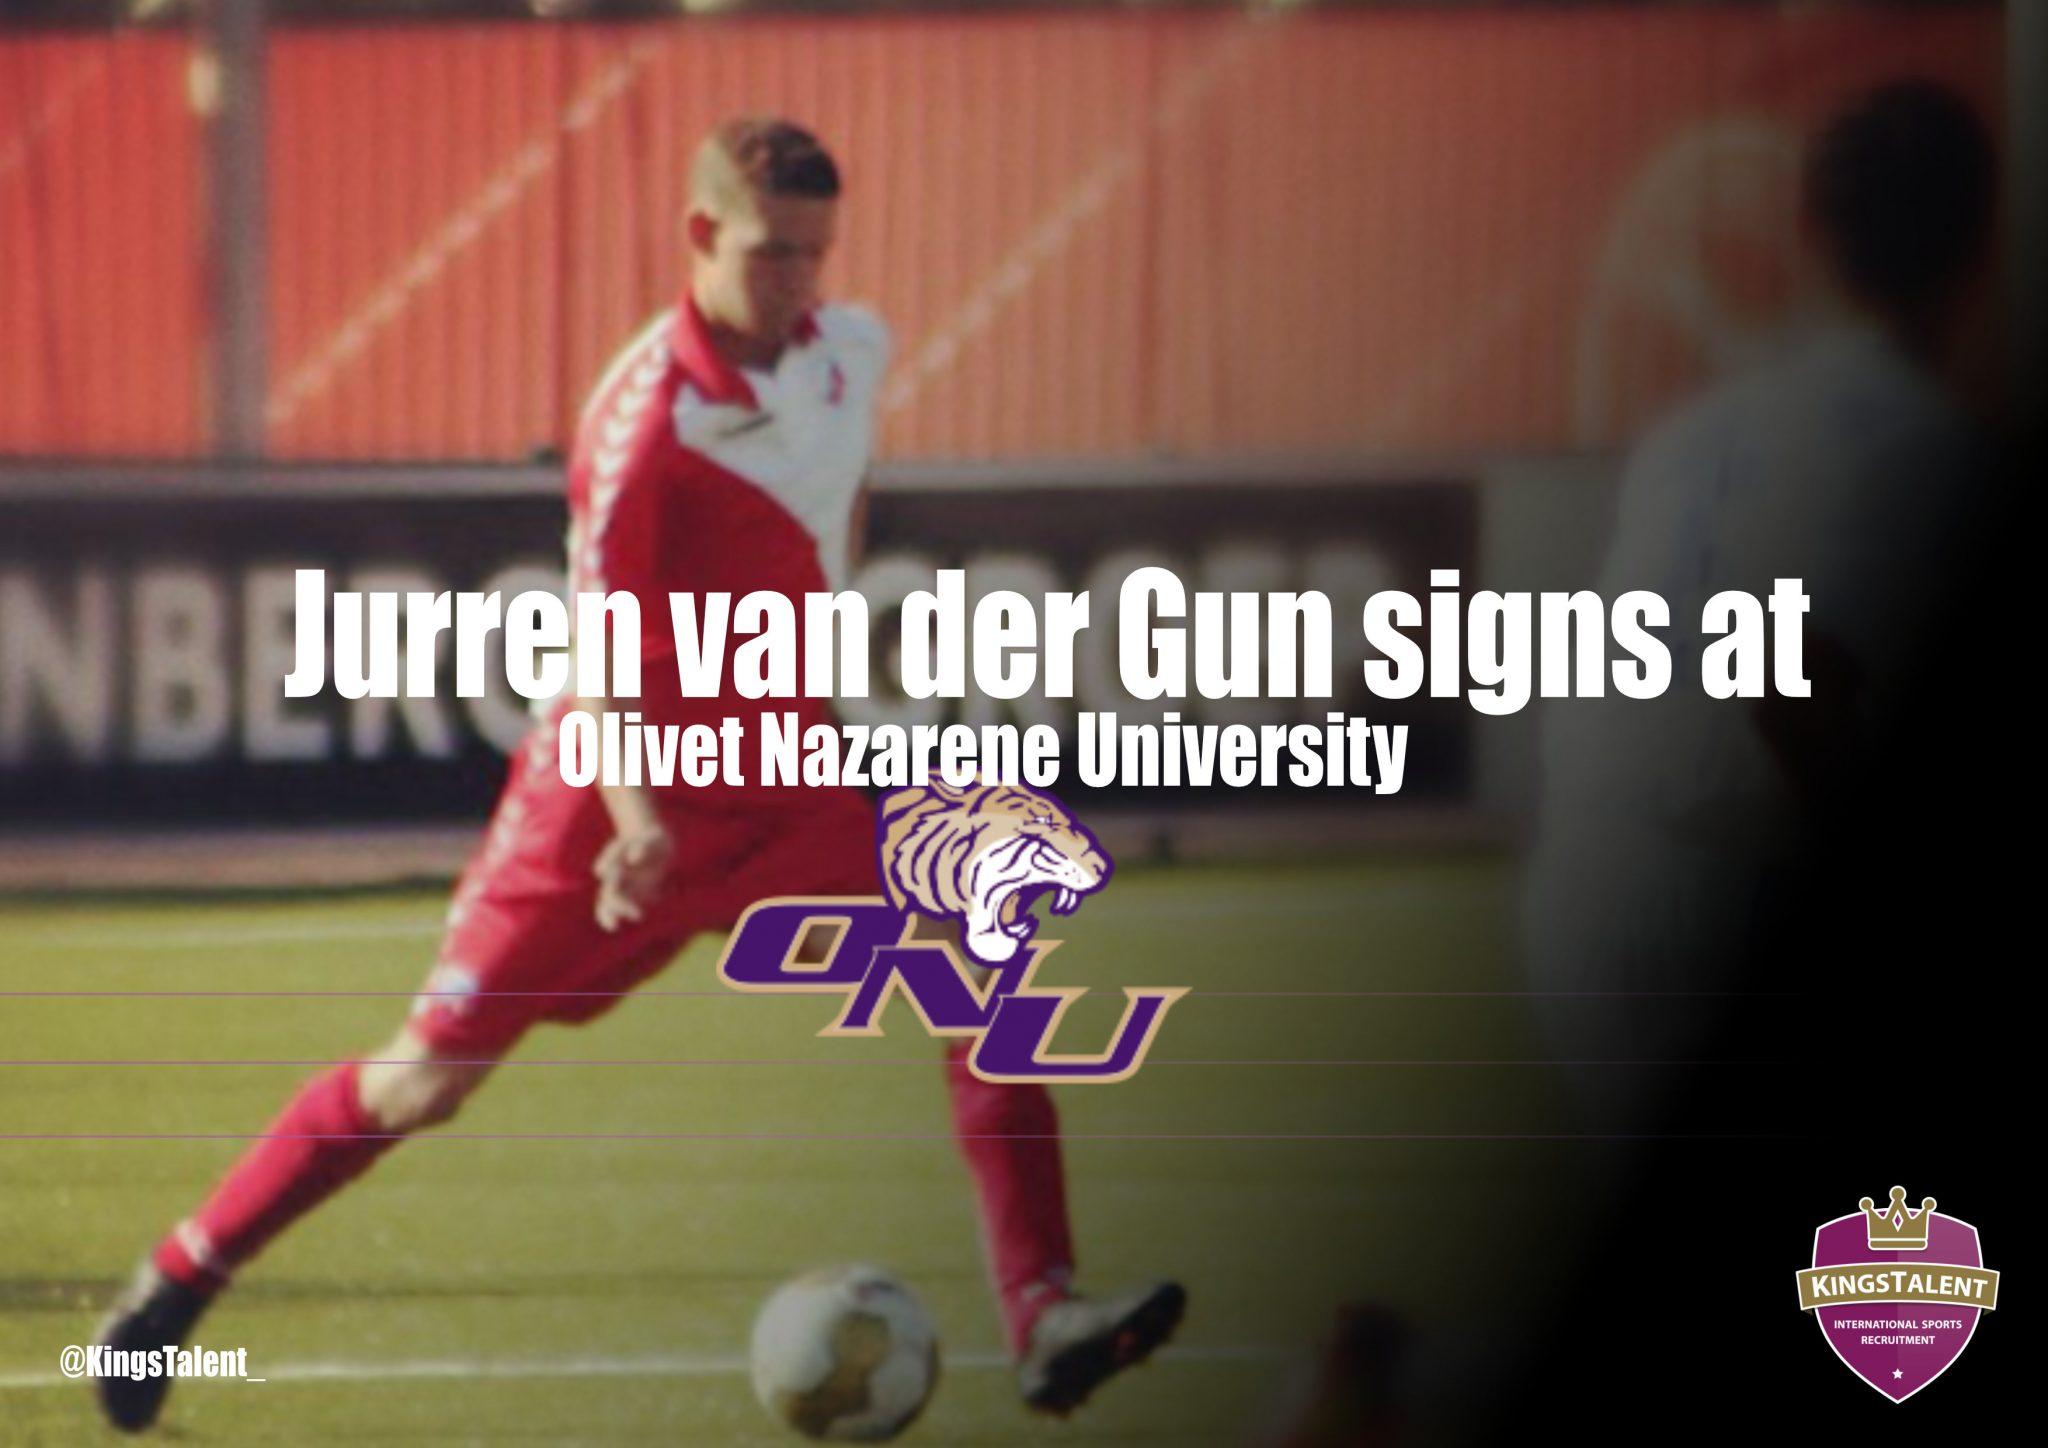 Jurren van der Gun signs at ONU2